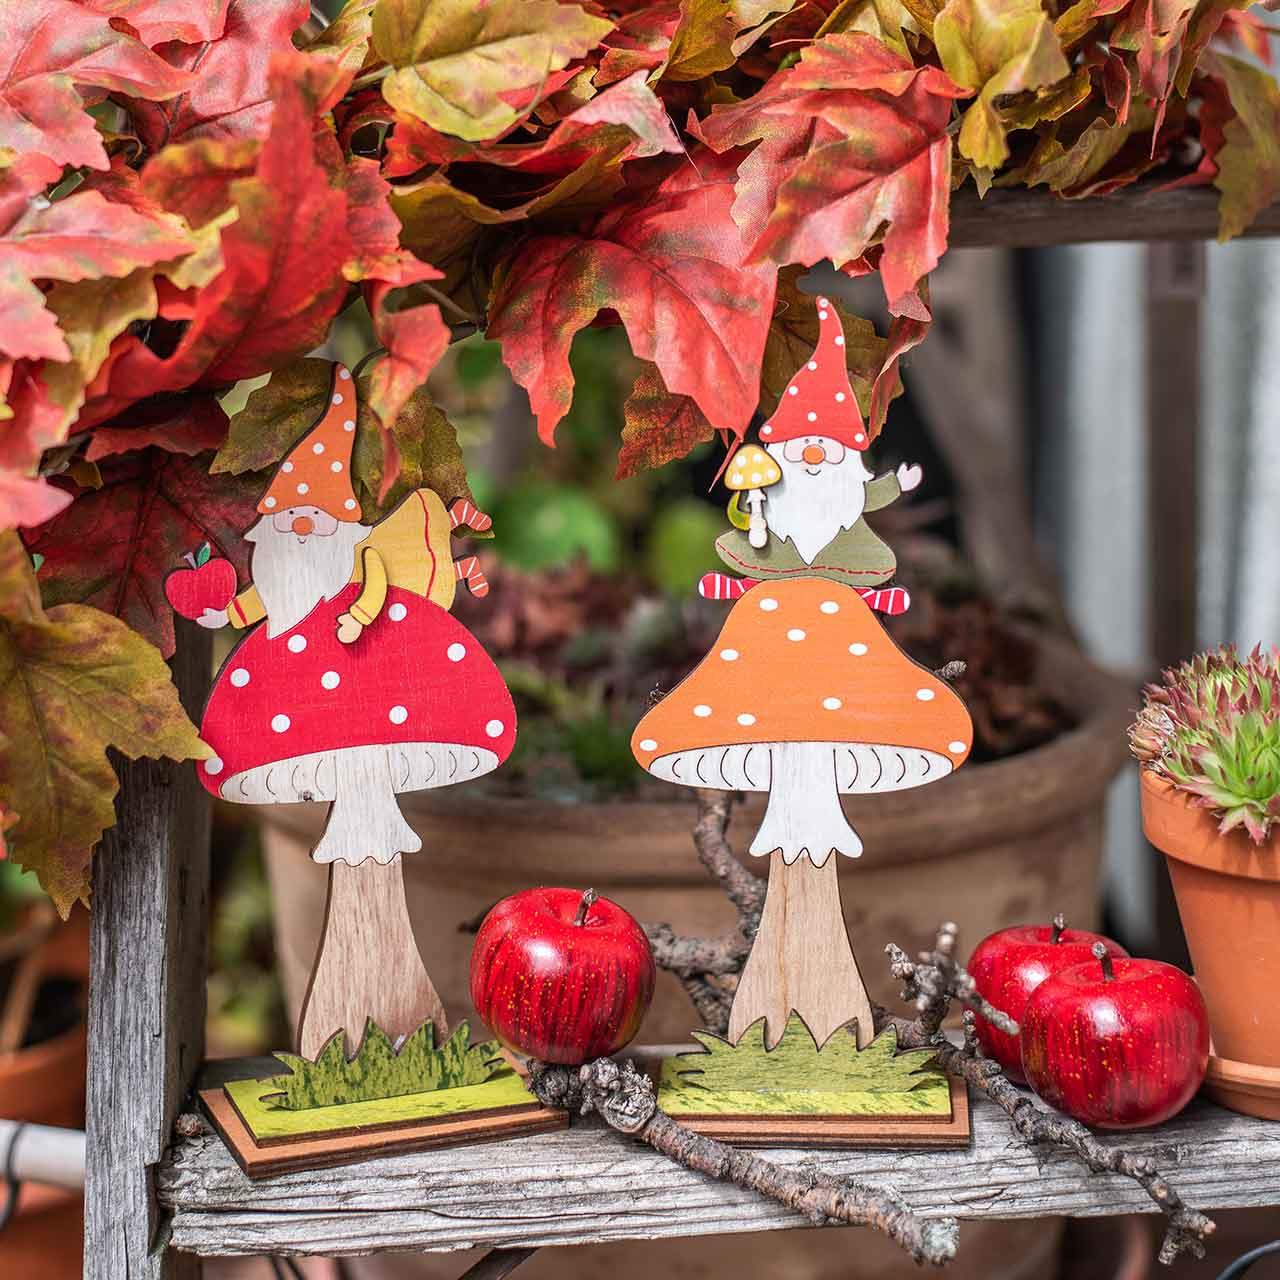 Fly agaric for autumn, wood decoration, gnome on mushroom orange / red H21 / 19.5cm 4pcs